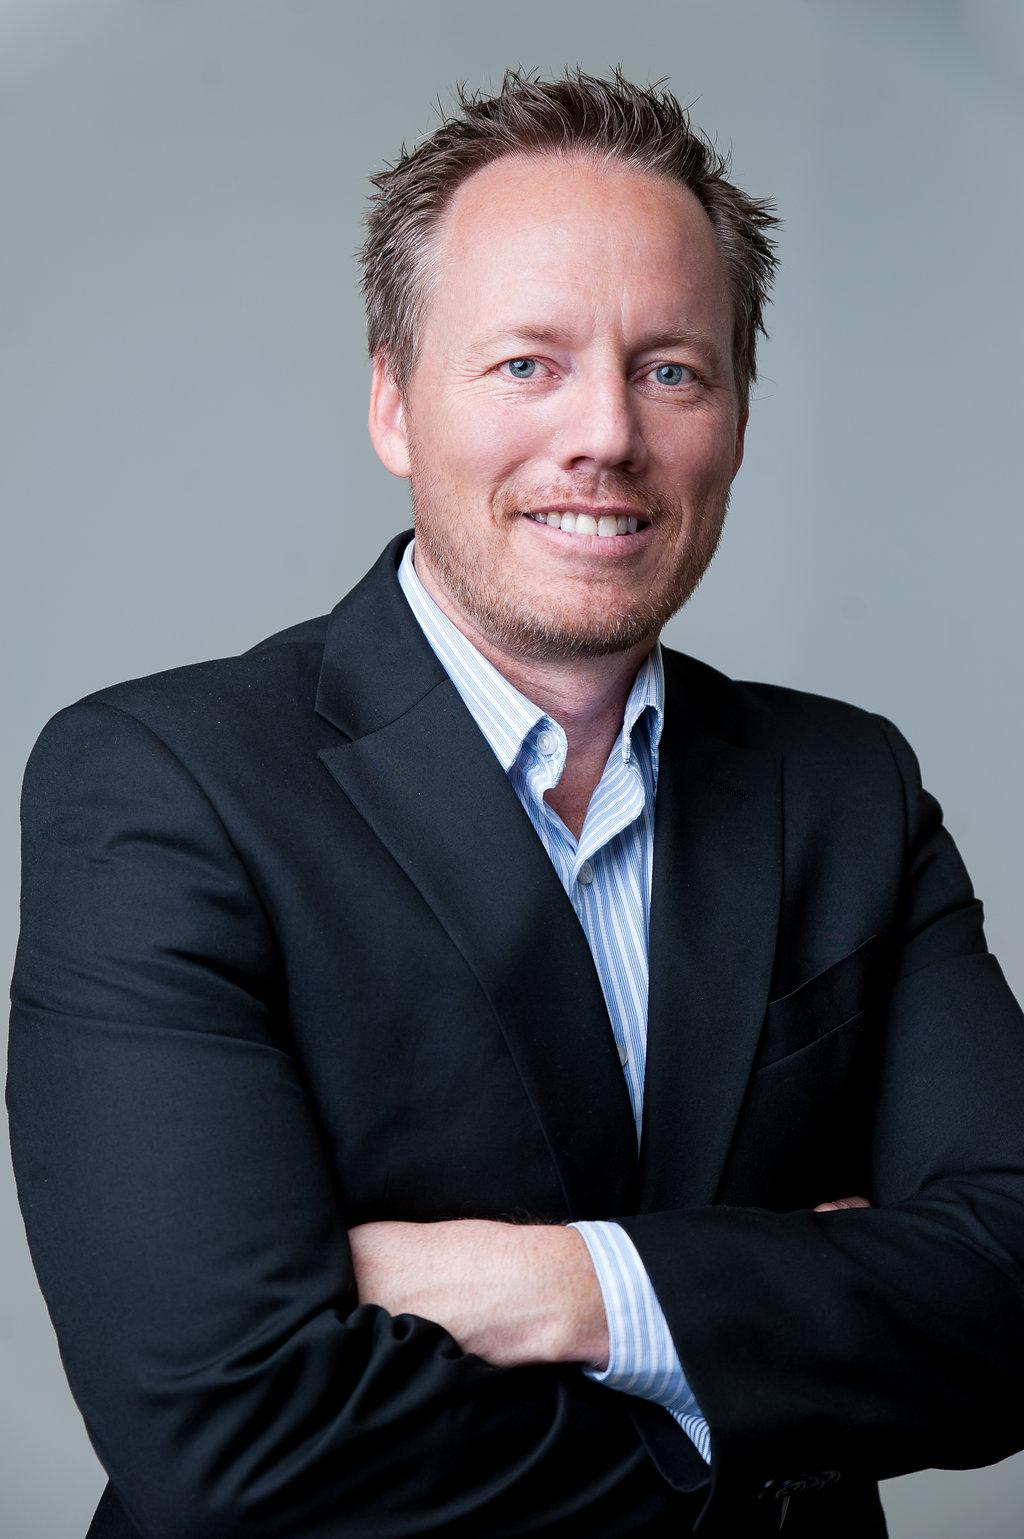 Michael Penrod